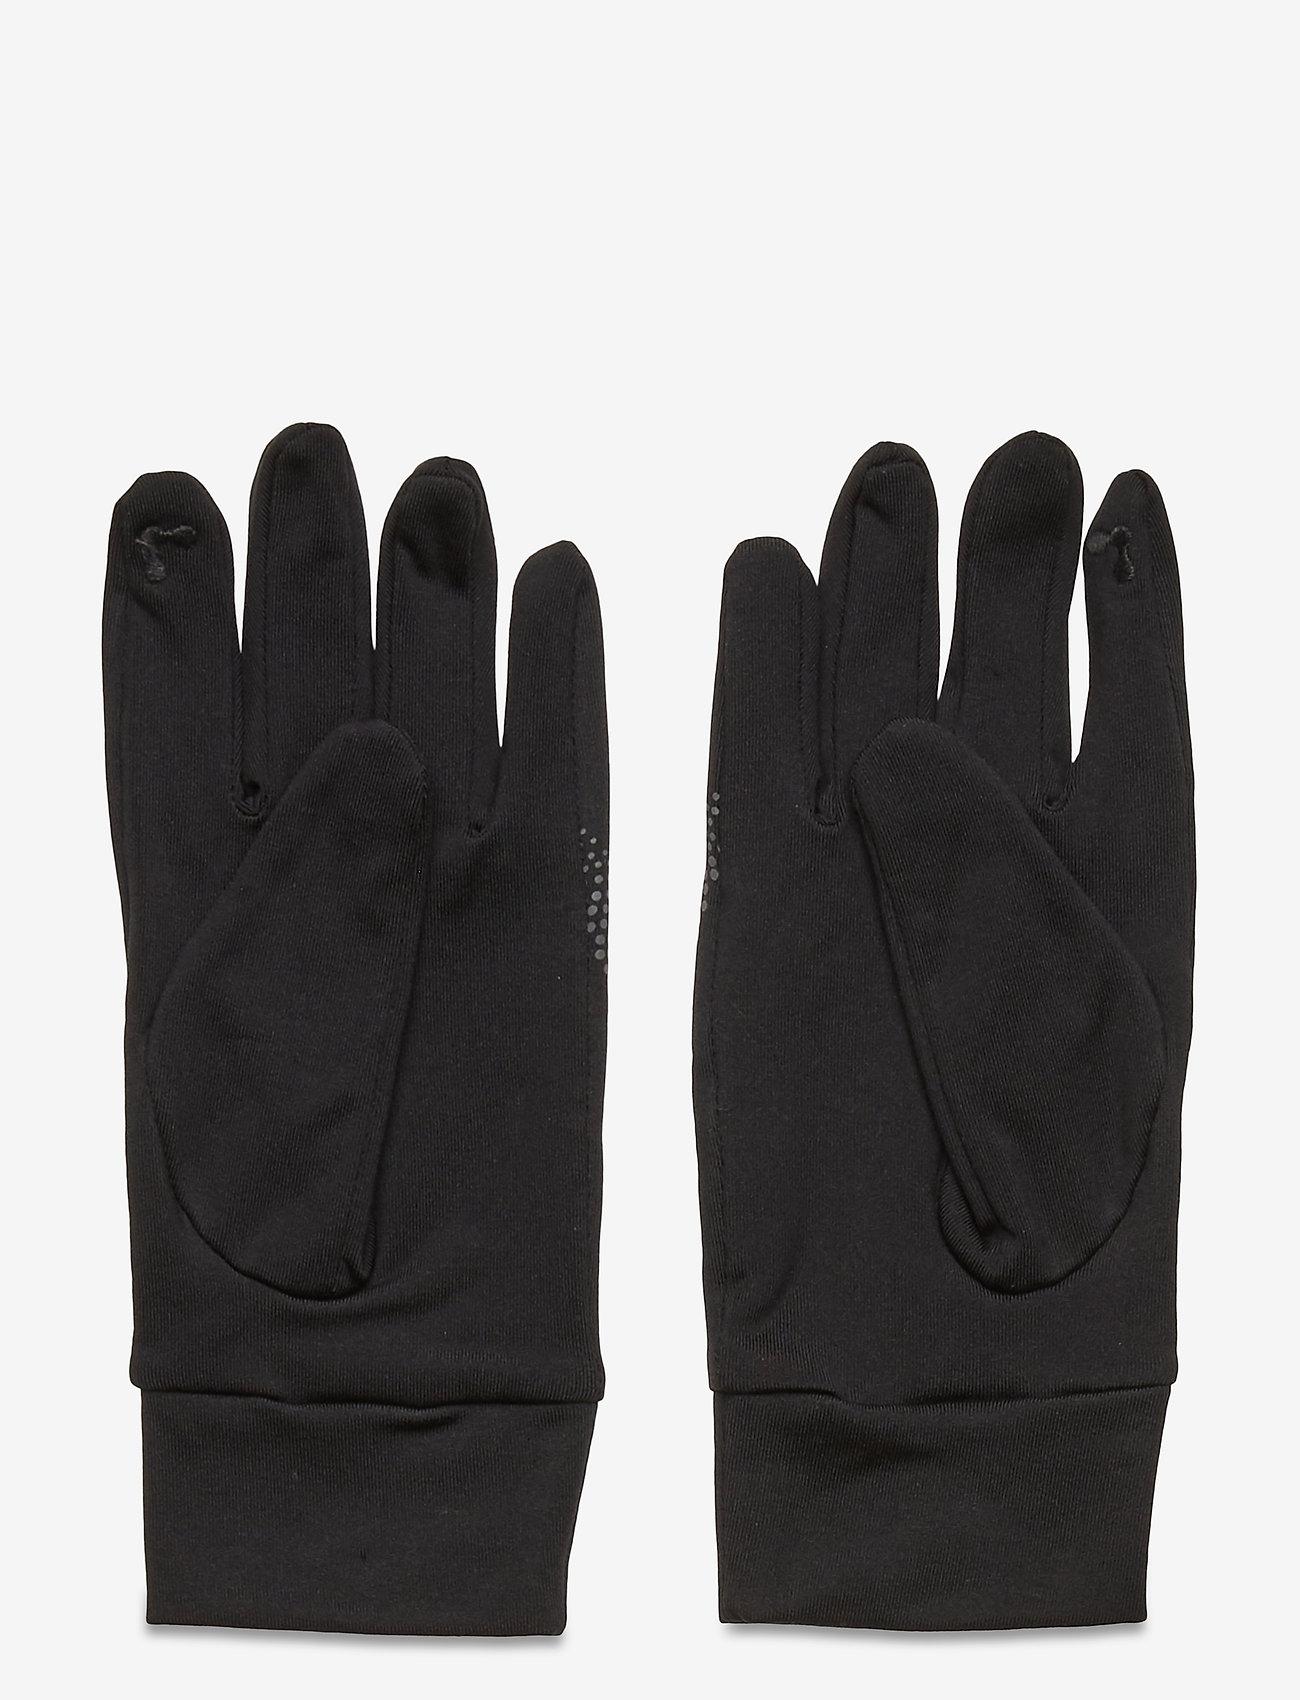 Craft - CORE ESSENCE THERMAL GLOVE - black - 1